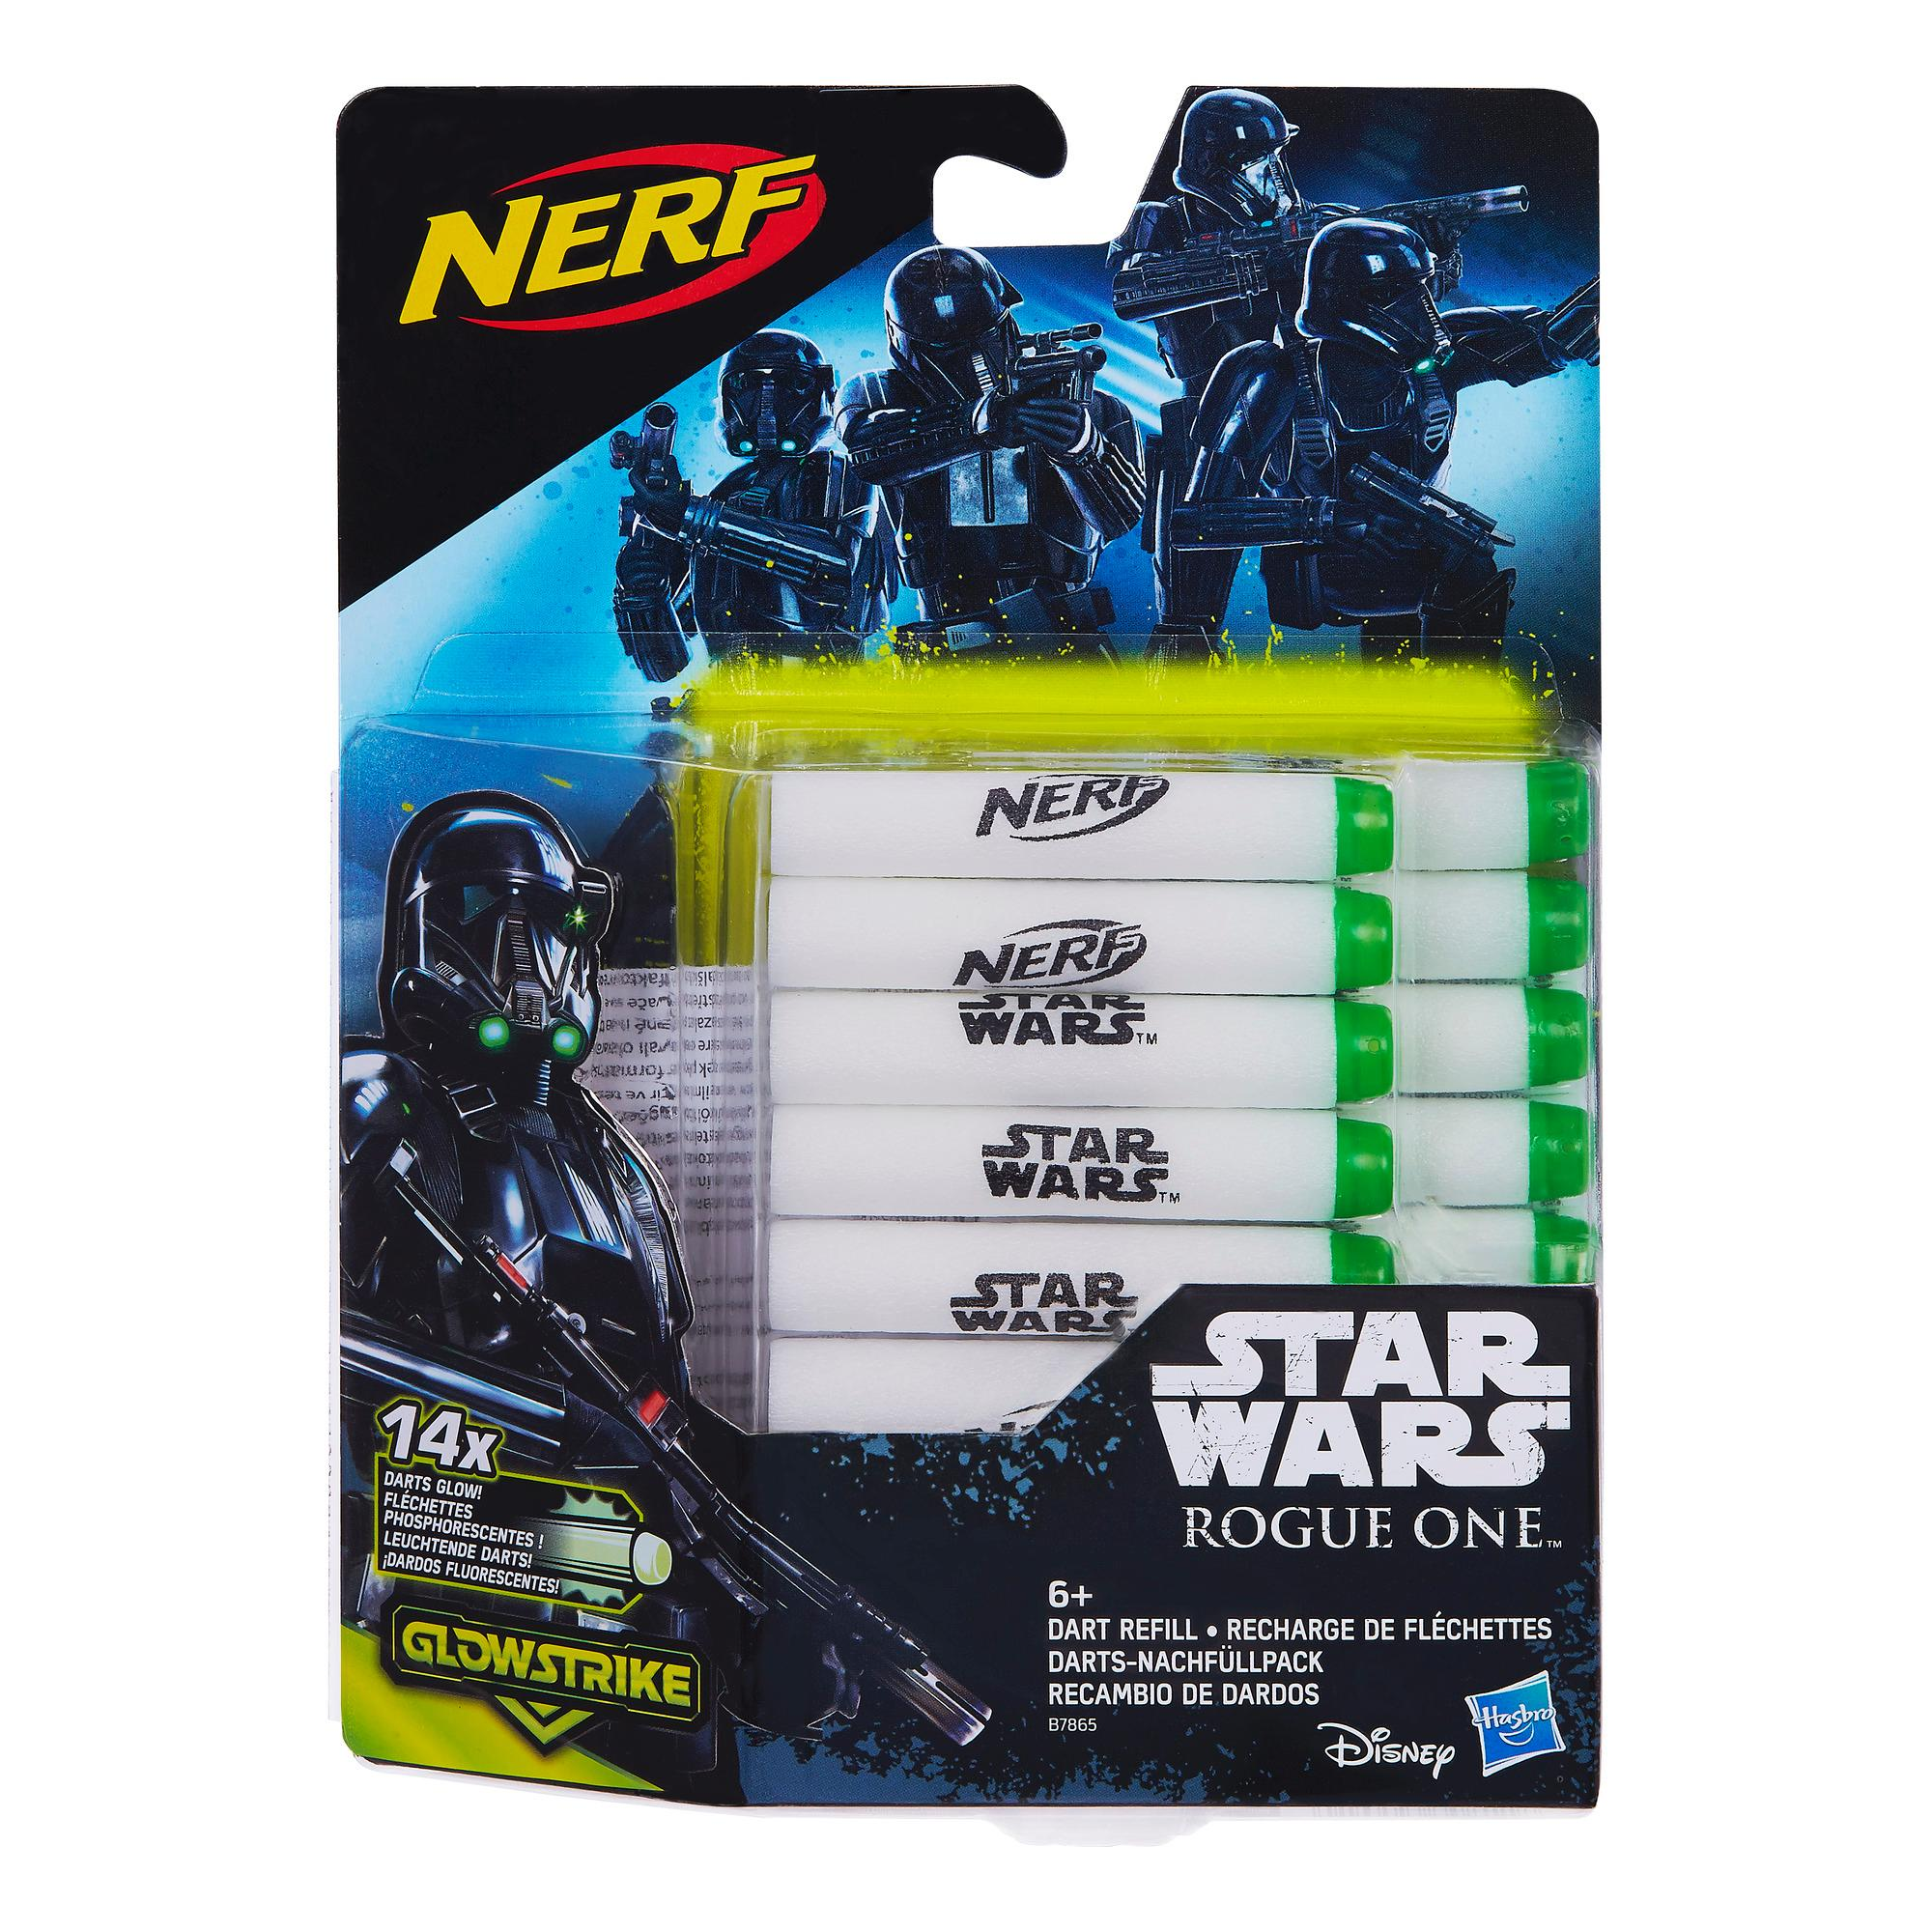 Star Wars Rogue One Nerf GlowStrike Dart Refill